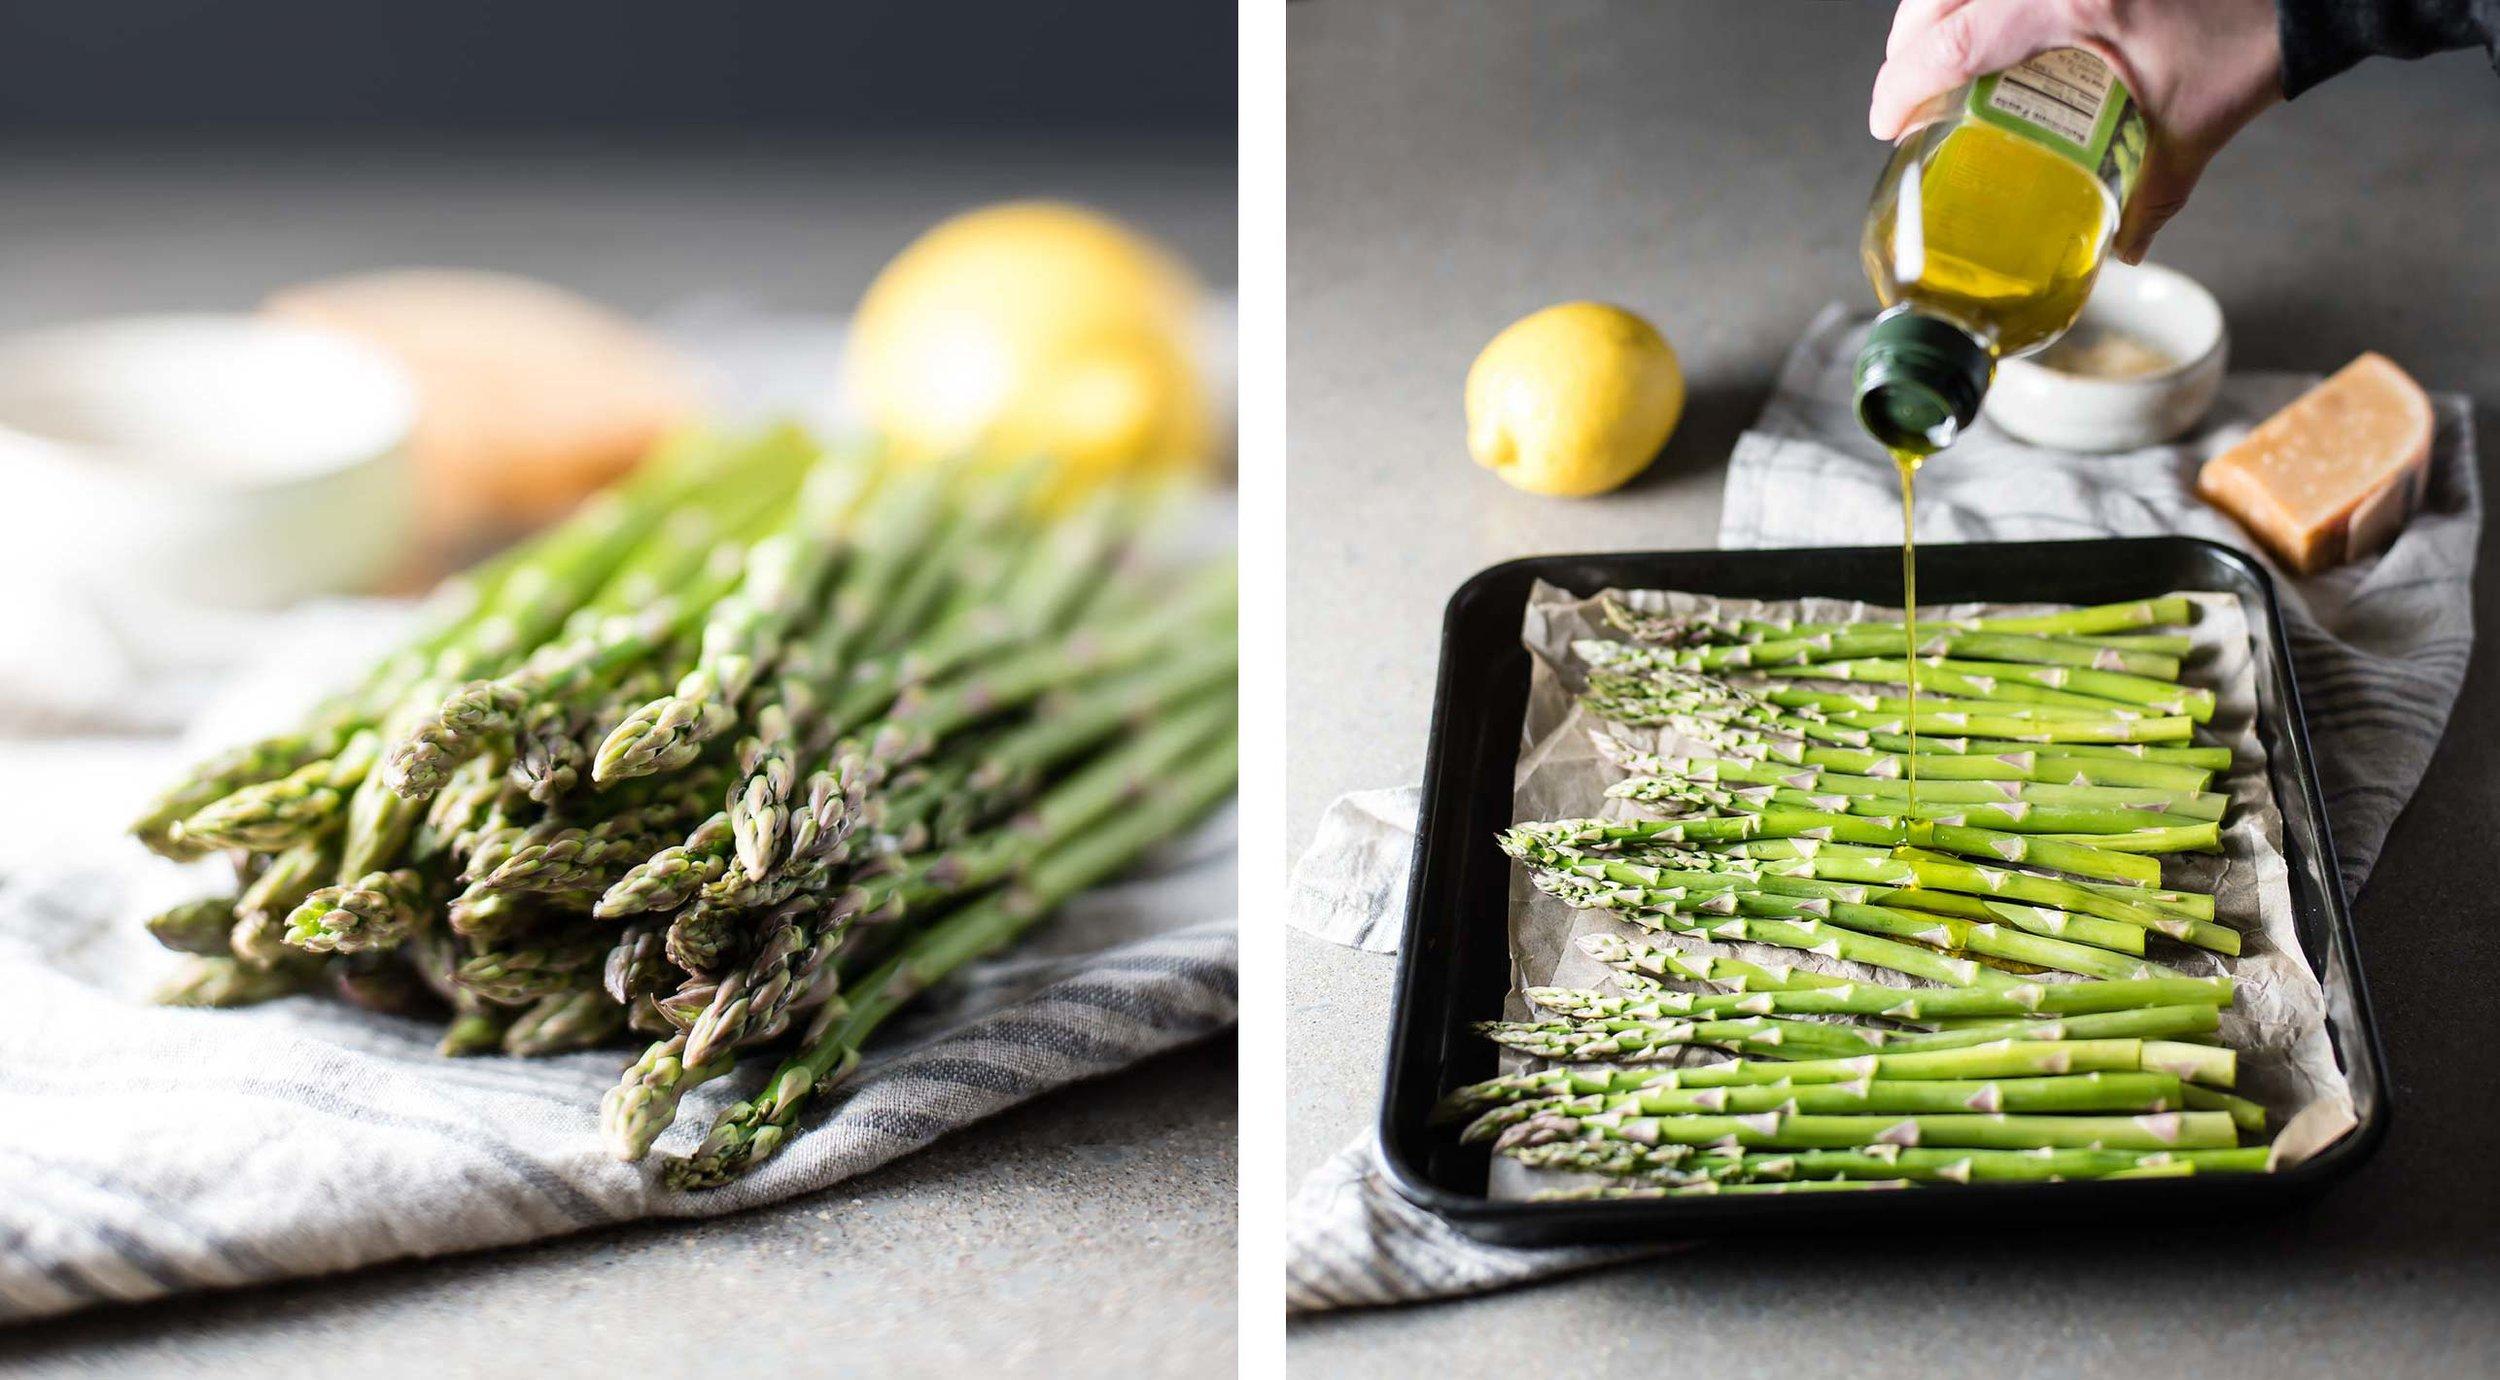 Roasted Asparagus with Lemon, Garlic & Parmesan